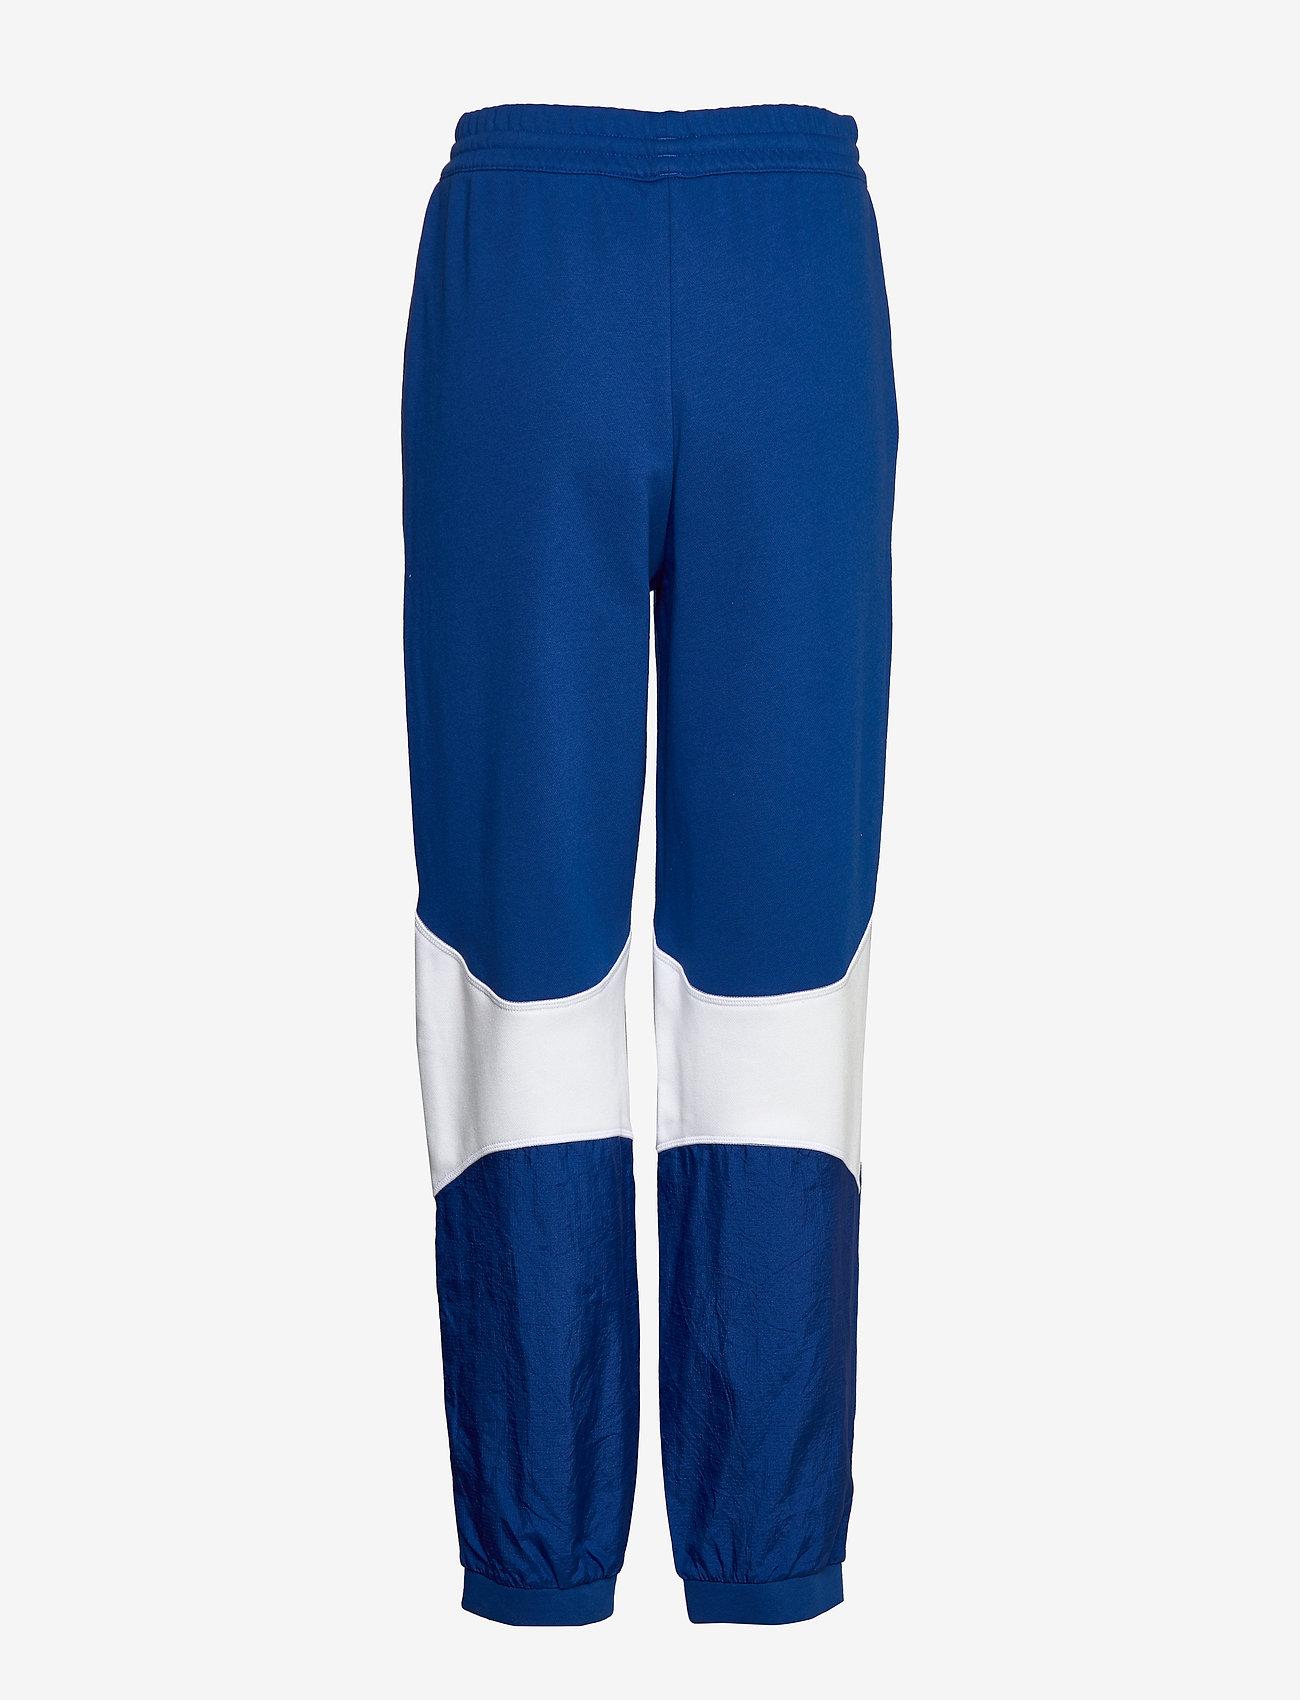 Pants (Croyal/white) (38.47 €) - adidas Originals iU5C7